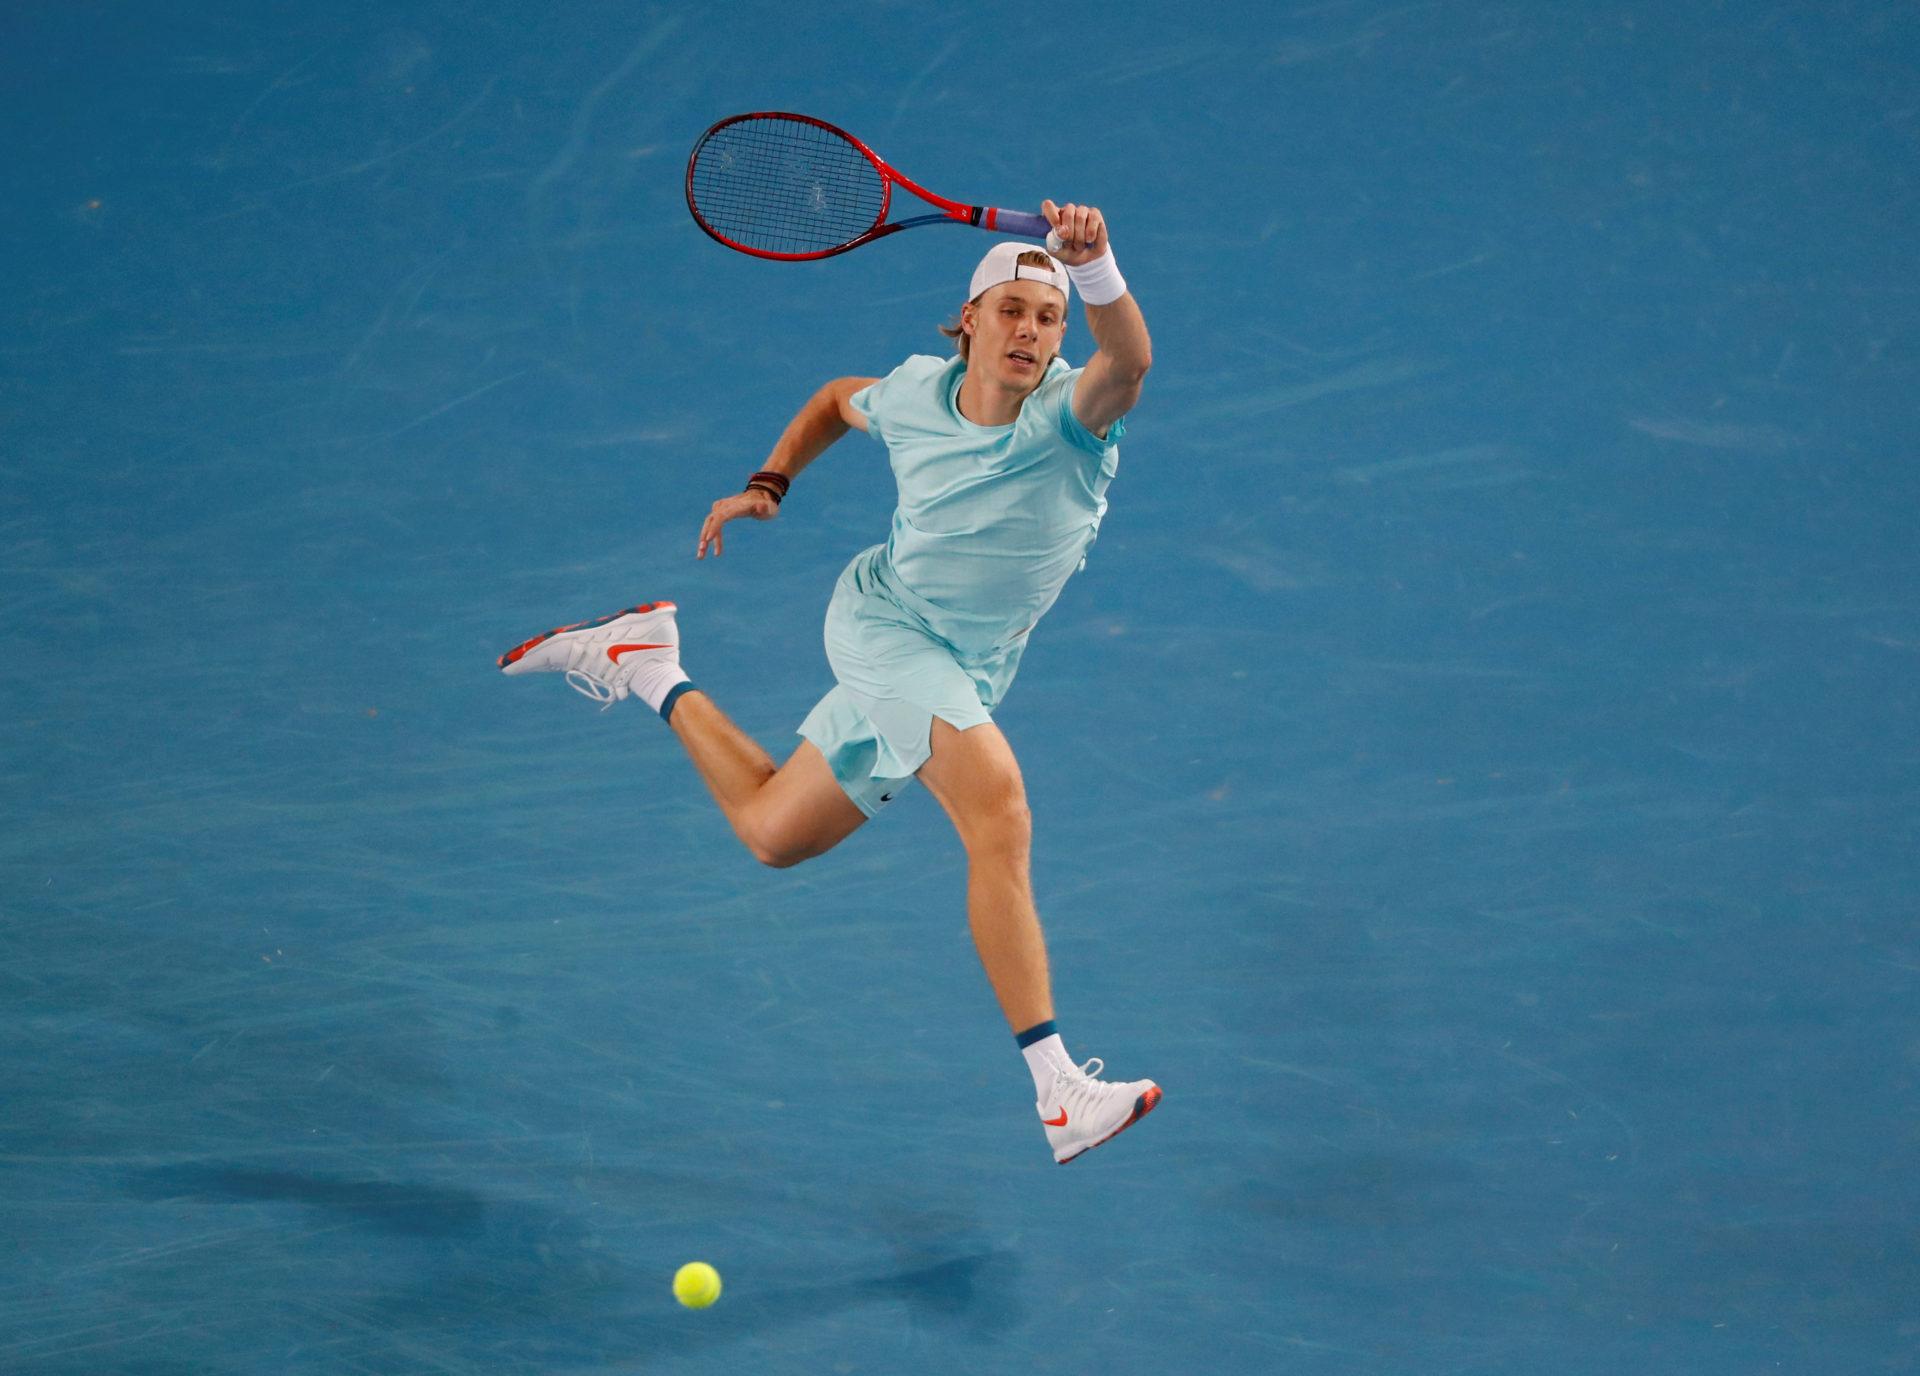 Dubai Open 2021: Denis Shapovalov vs. Hubert Hurkacz Tennis Pick and Prediction